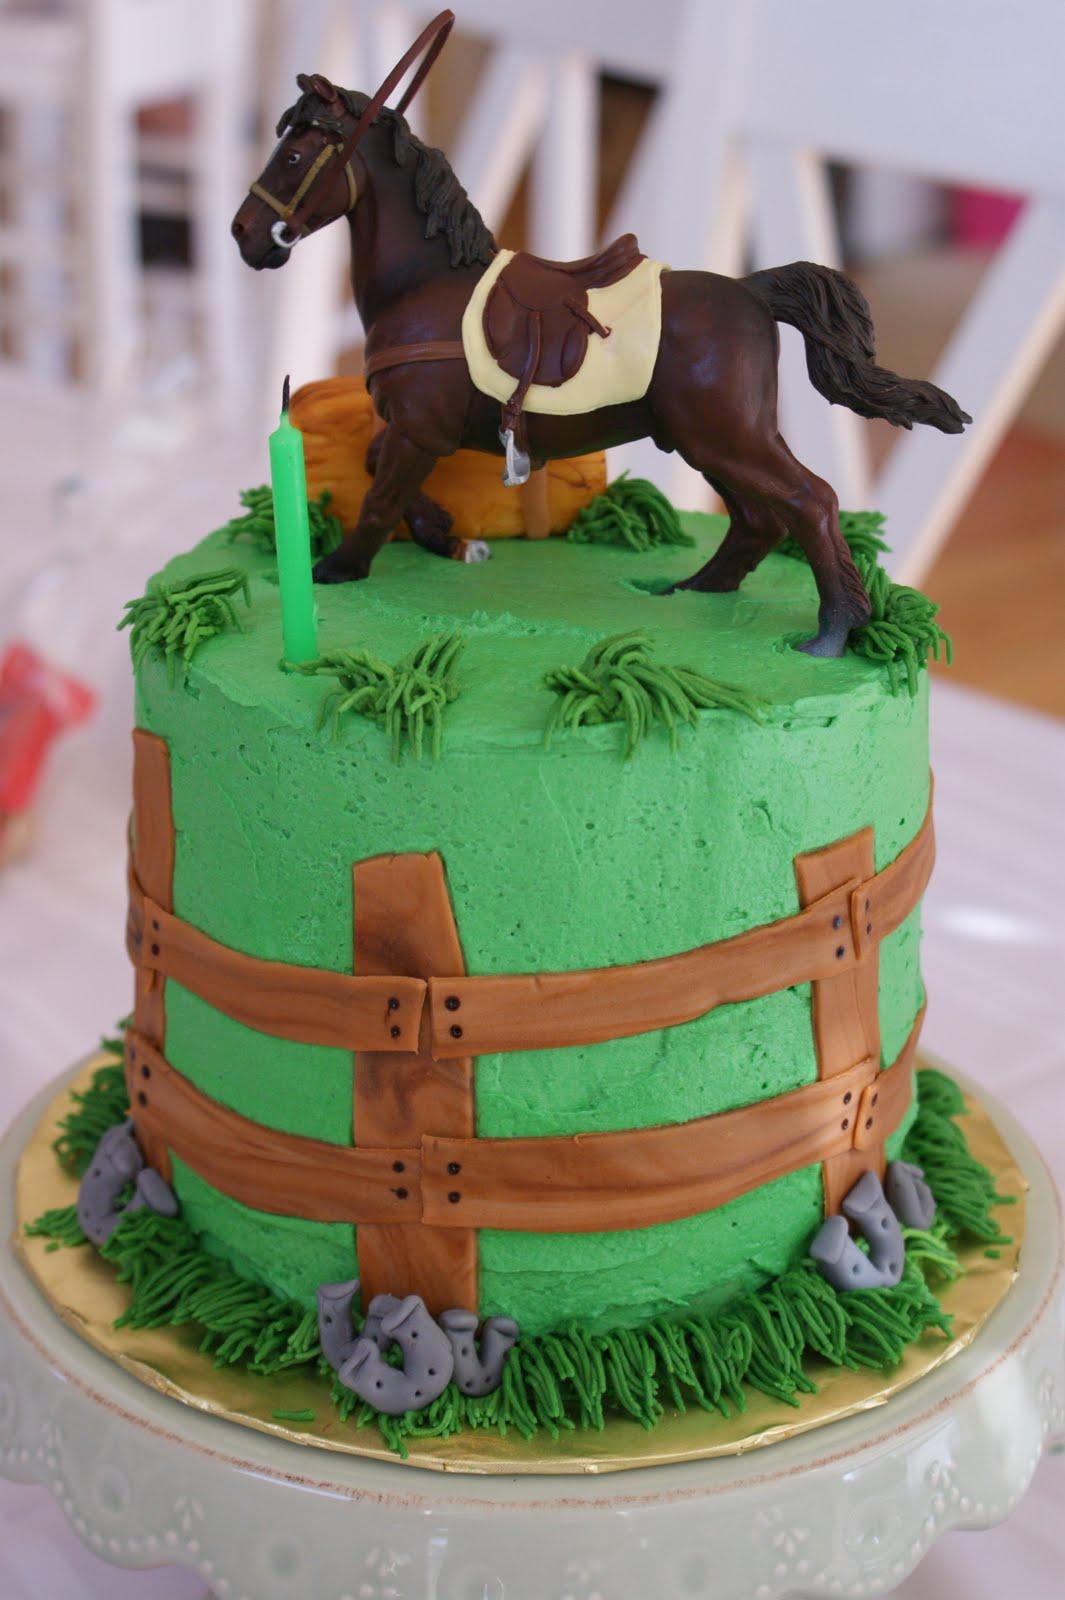 Birthday Cake Ideas With Horses : Raising Sweet Souls....: Happy Birthday Lindy & Paige